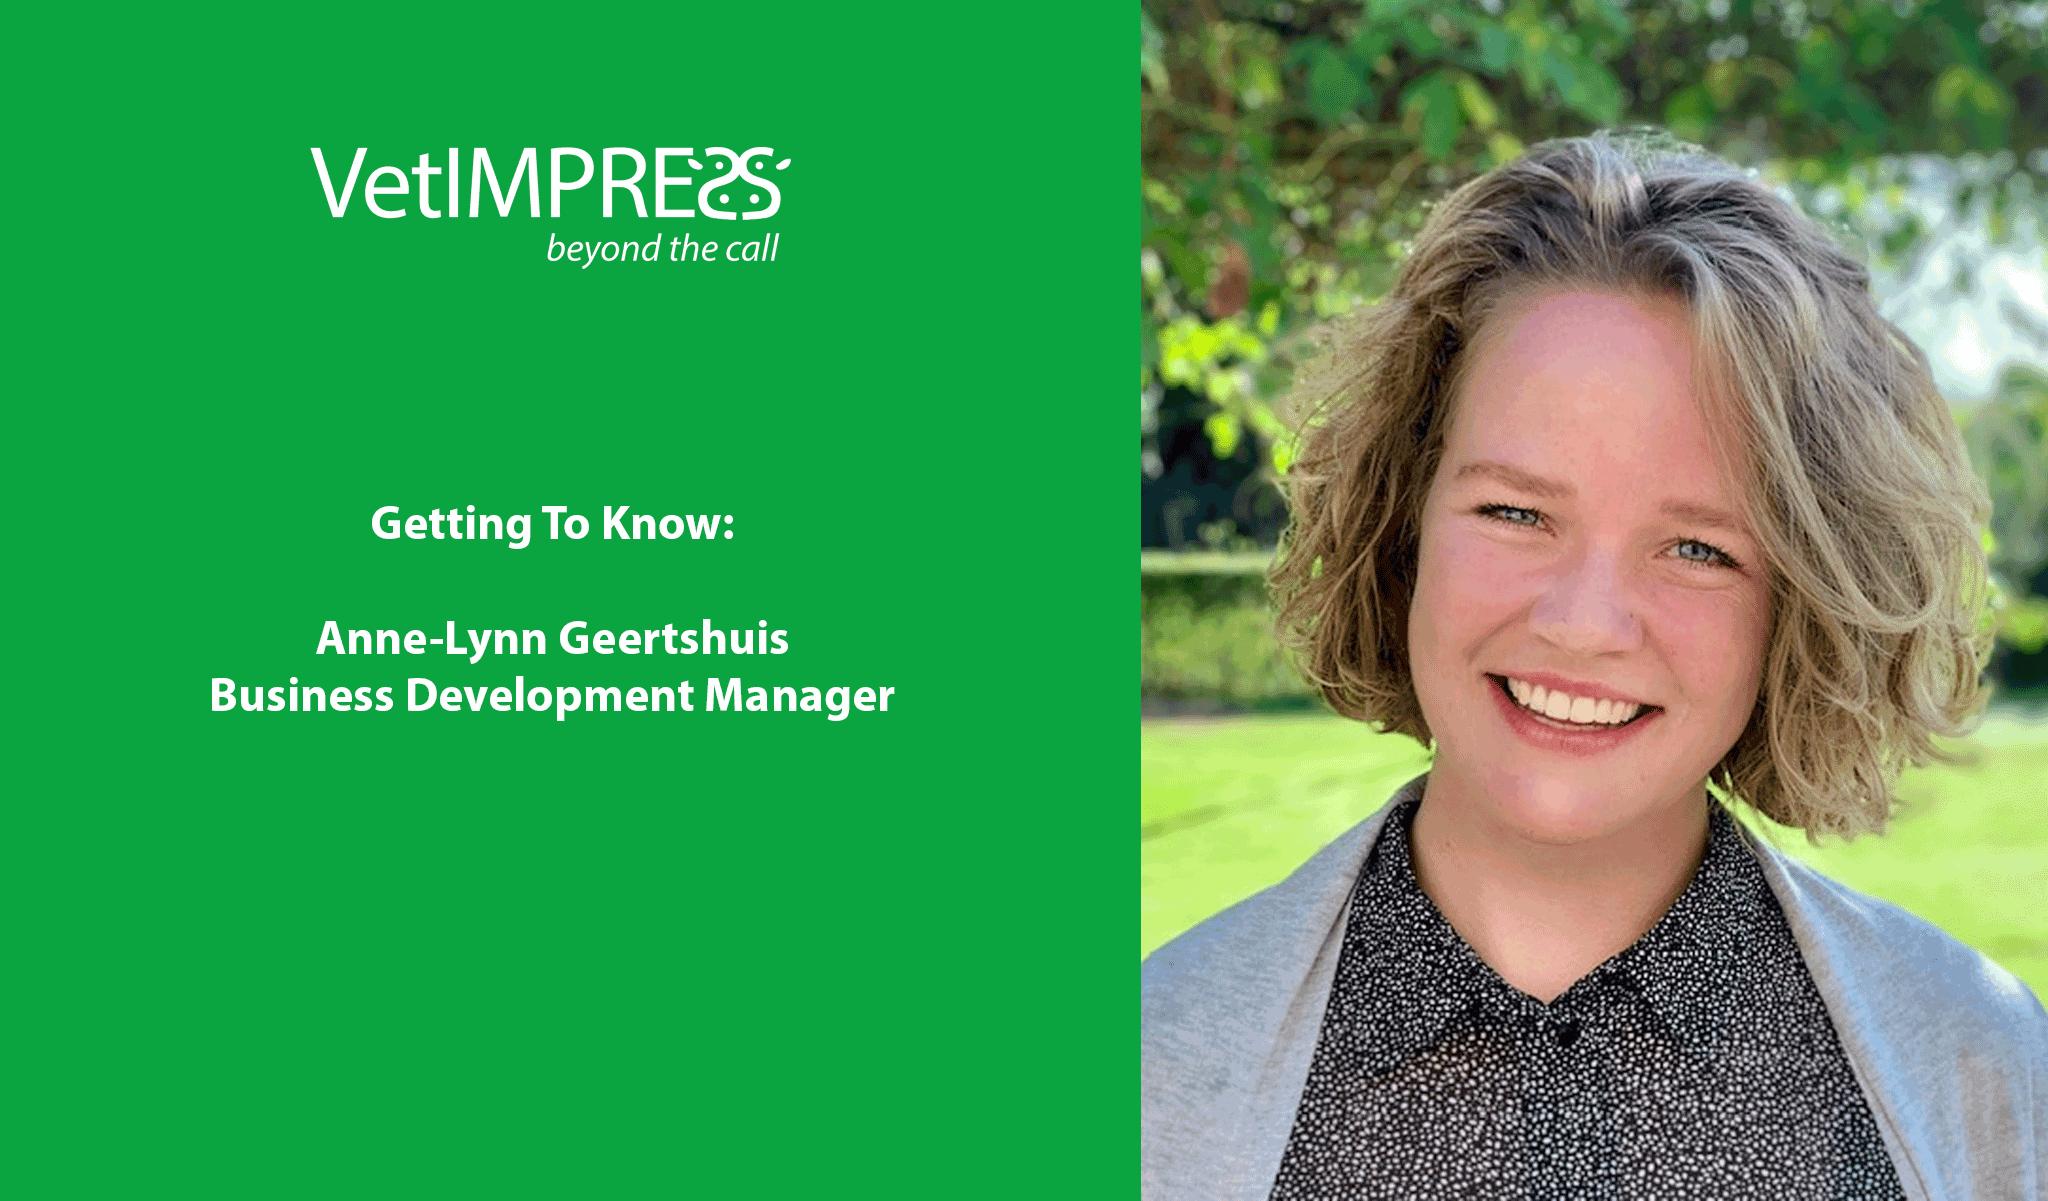 Business Development Manager The Netherlands